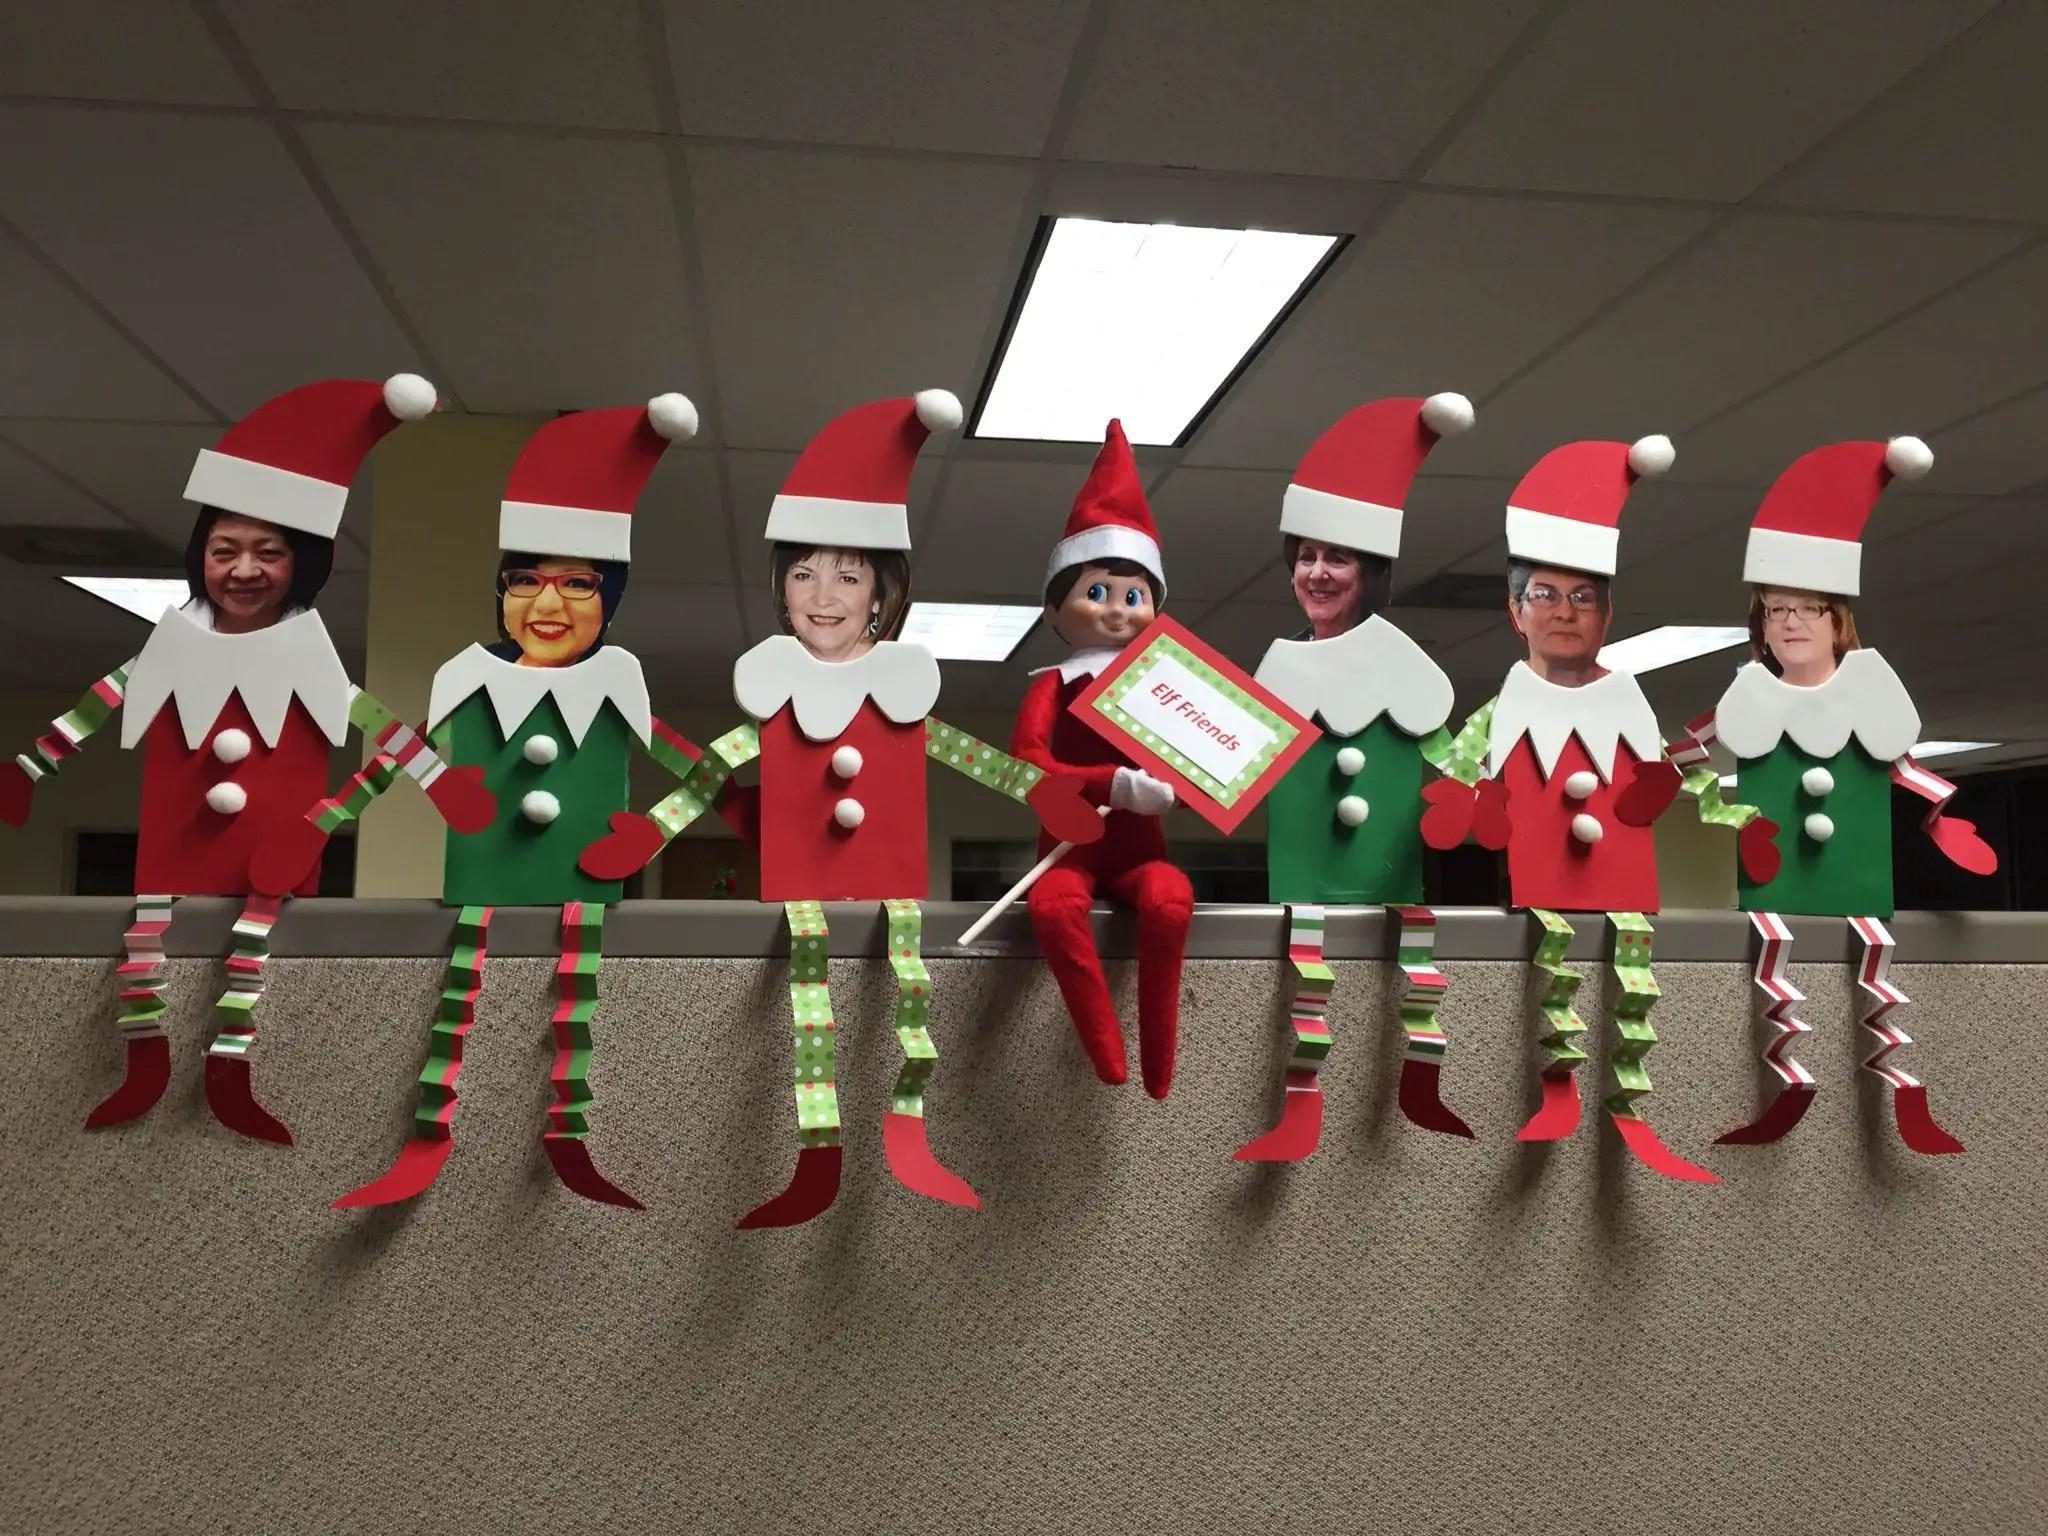 christmas decorating ideas office. Christmas Office Decorations 31 Decorating Ideas +